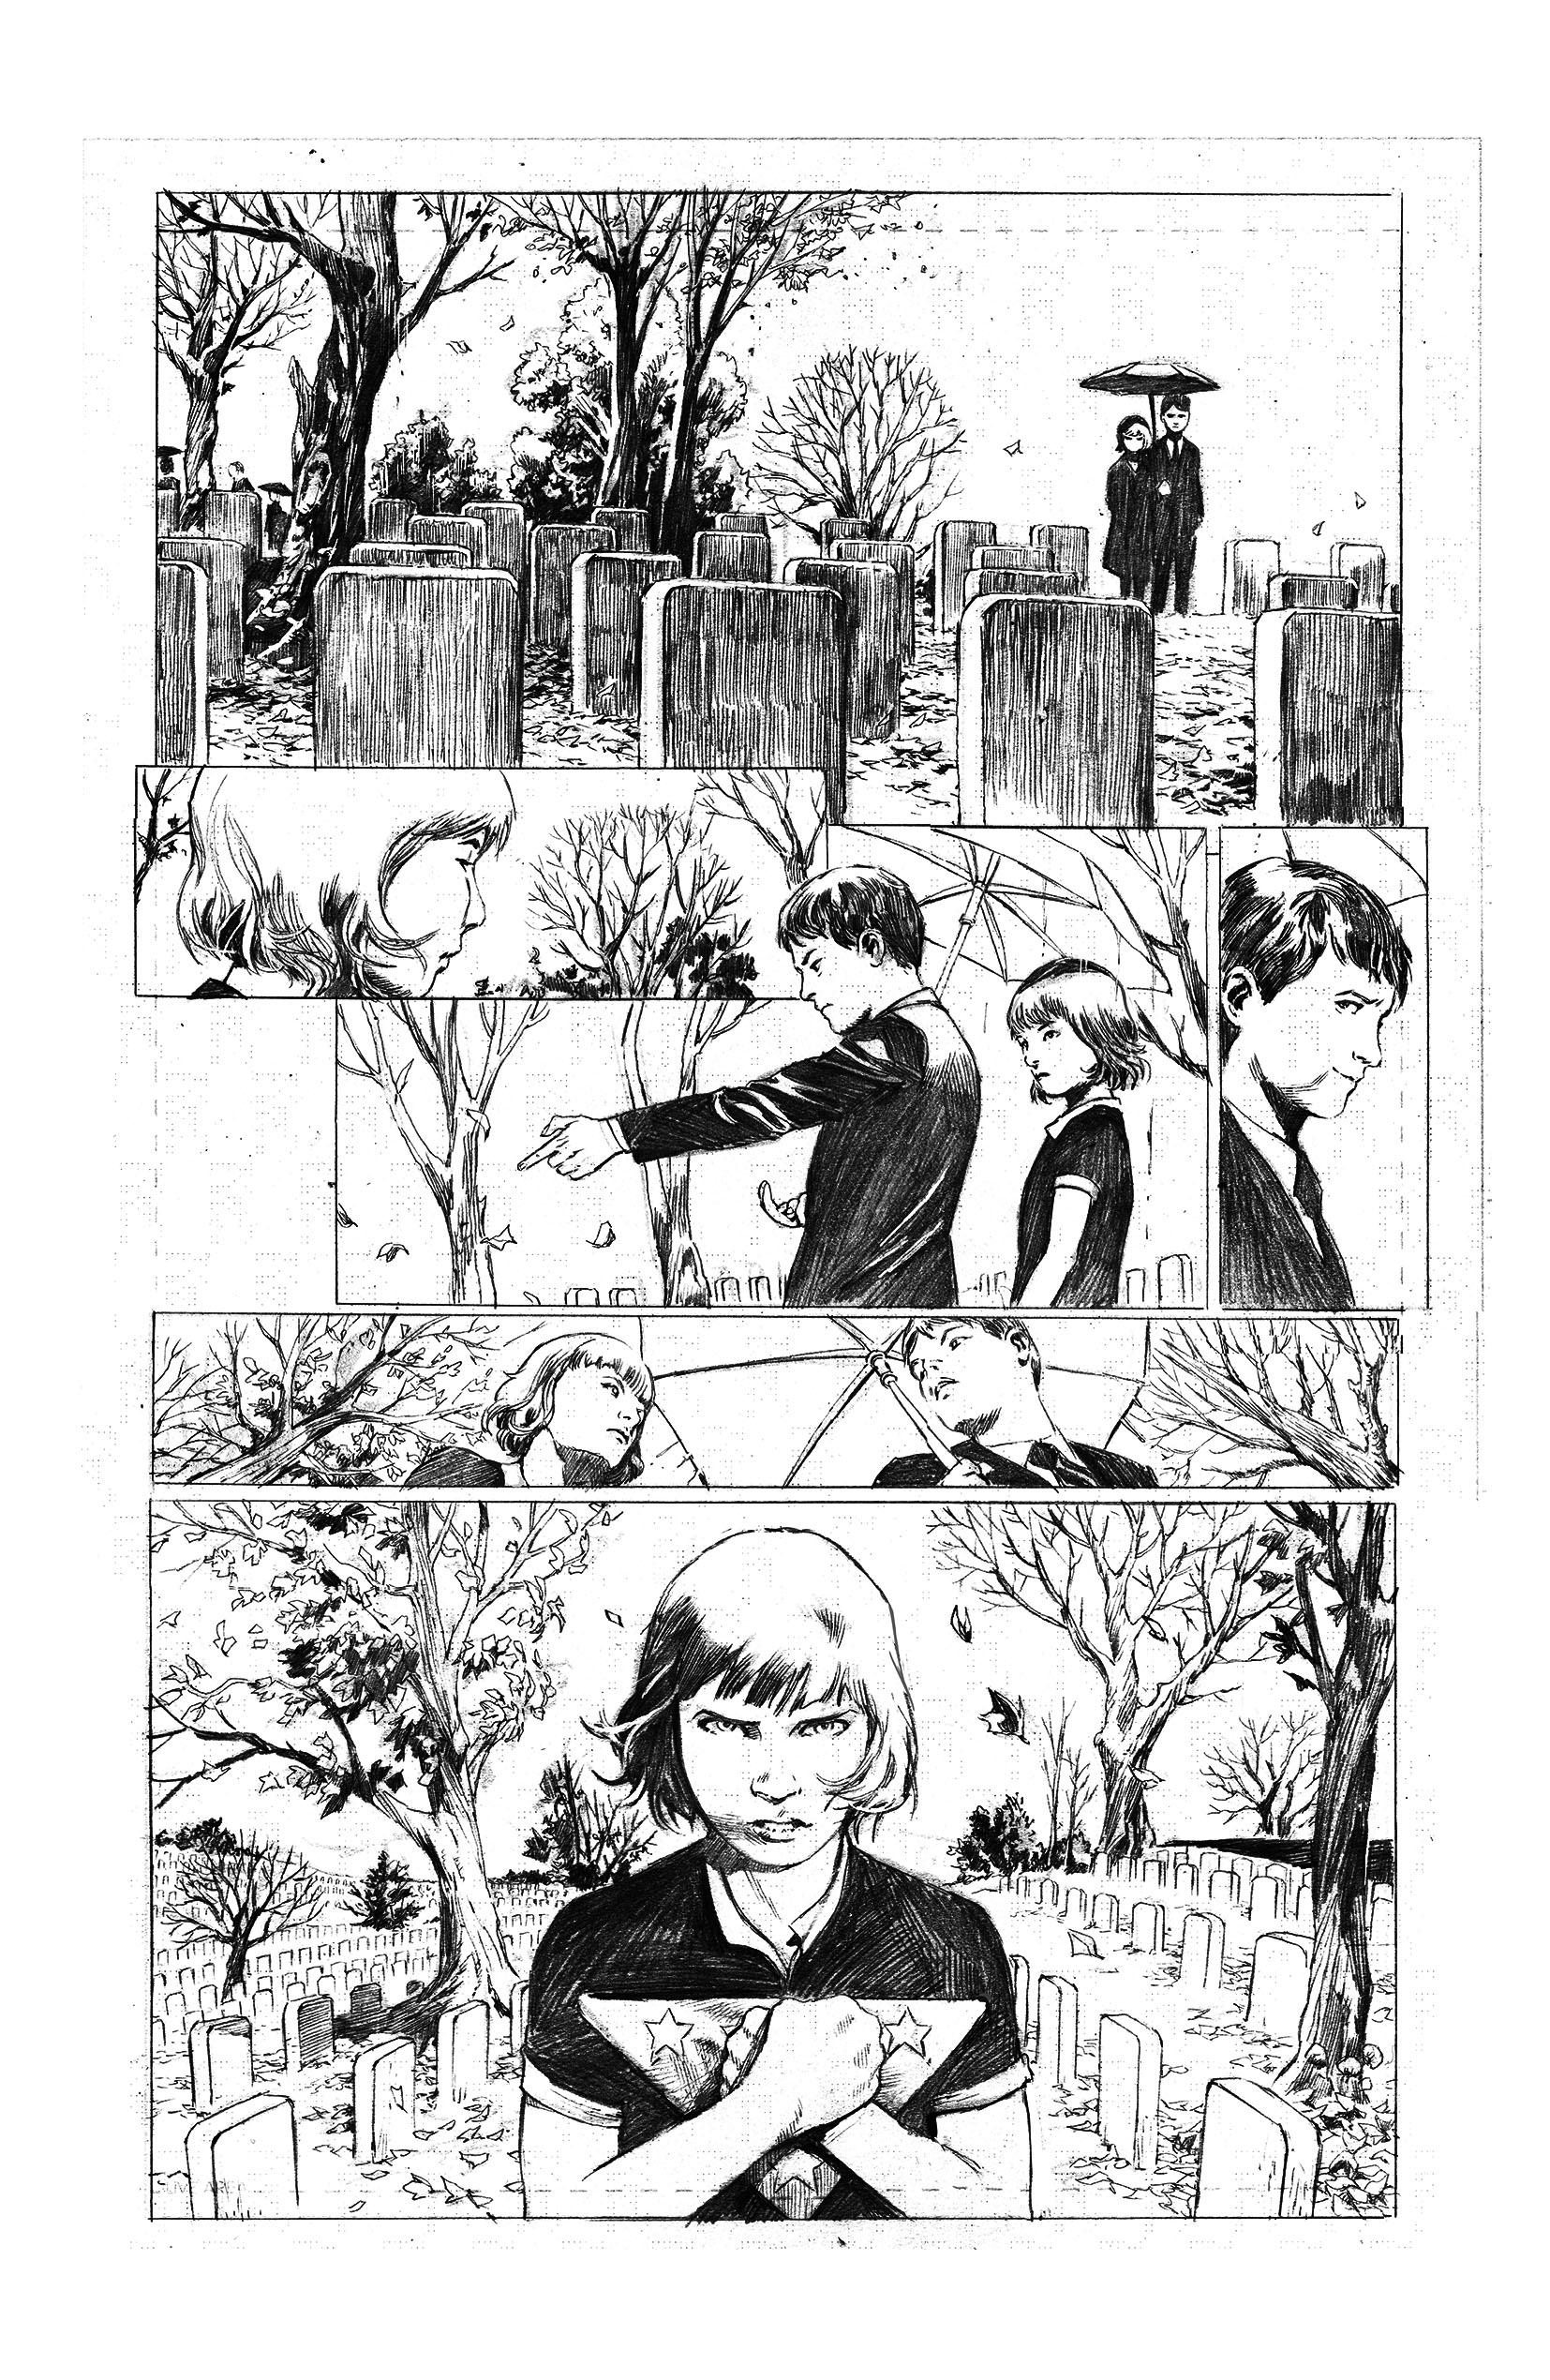 Detective Comics #975 page 4